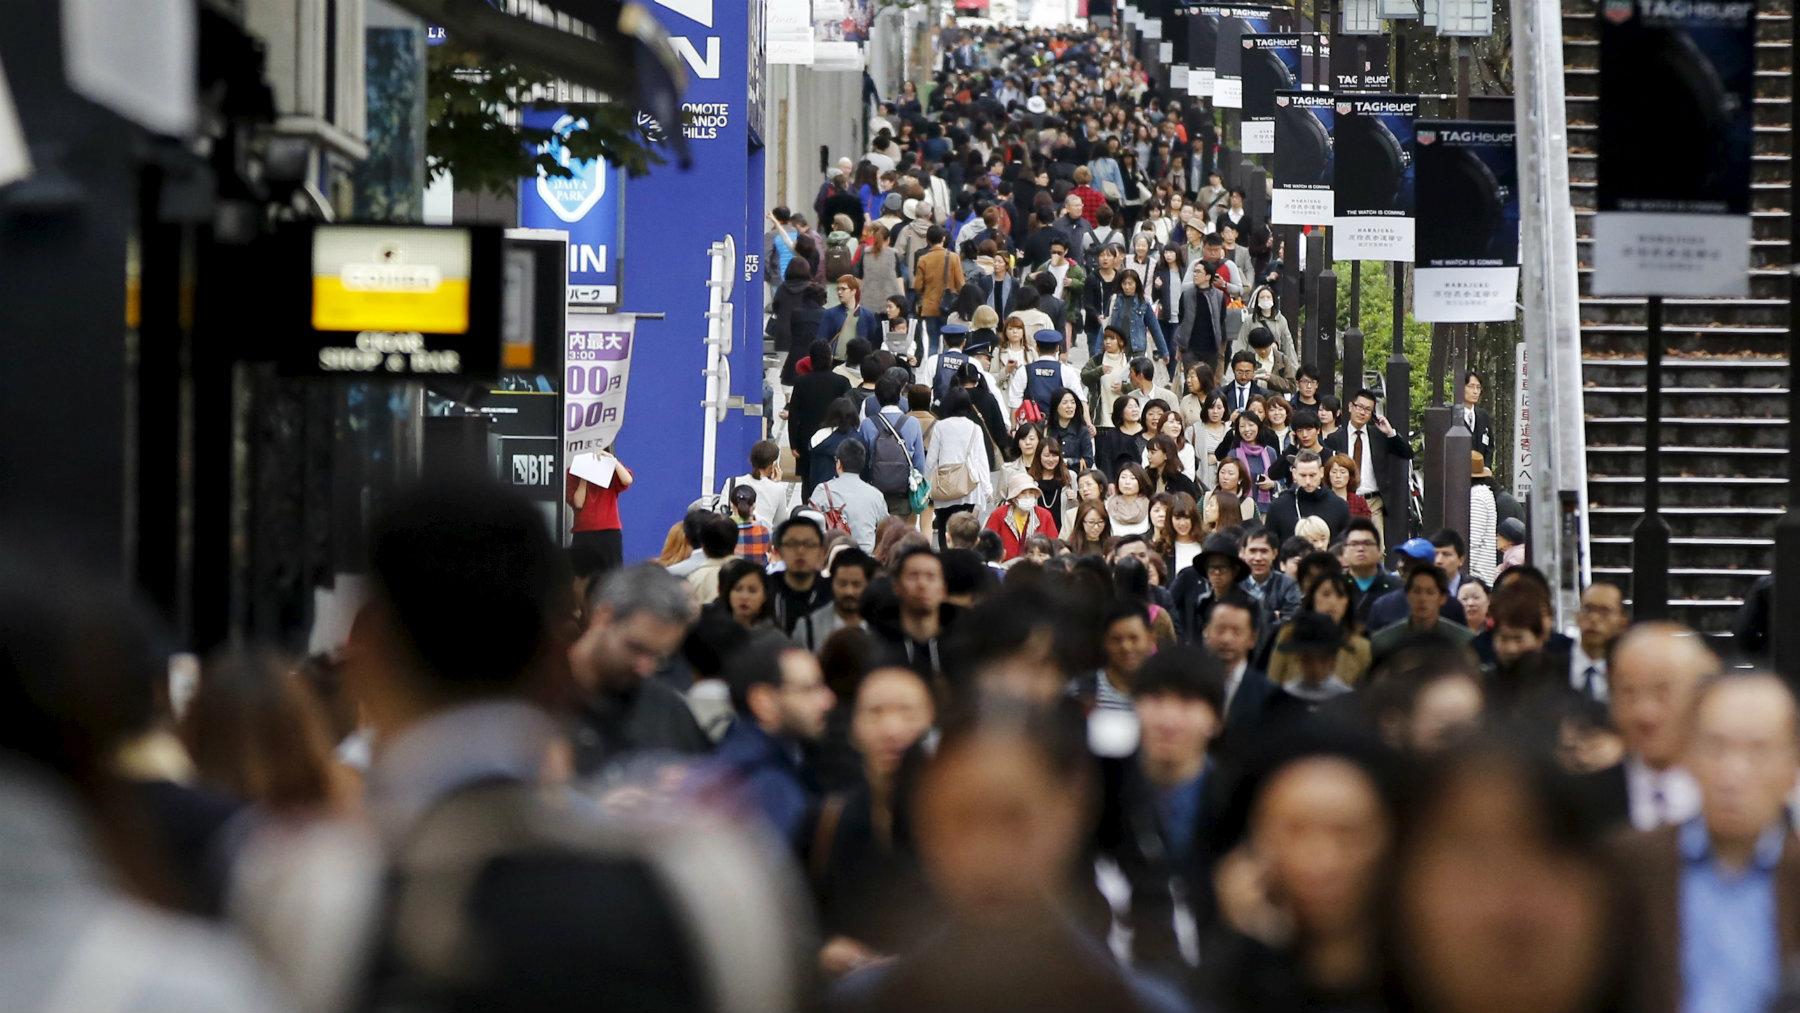 People walk in Tokyo's Omotesando shopping district.